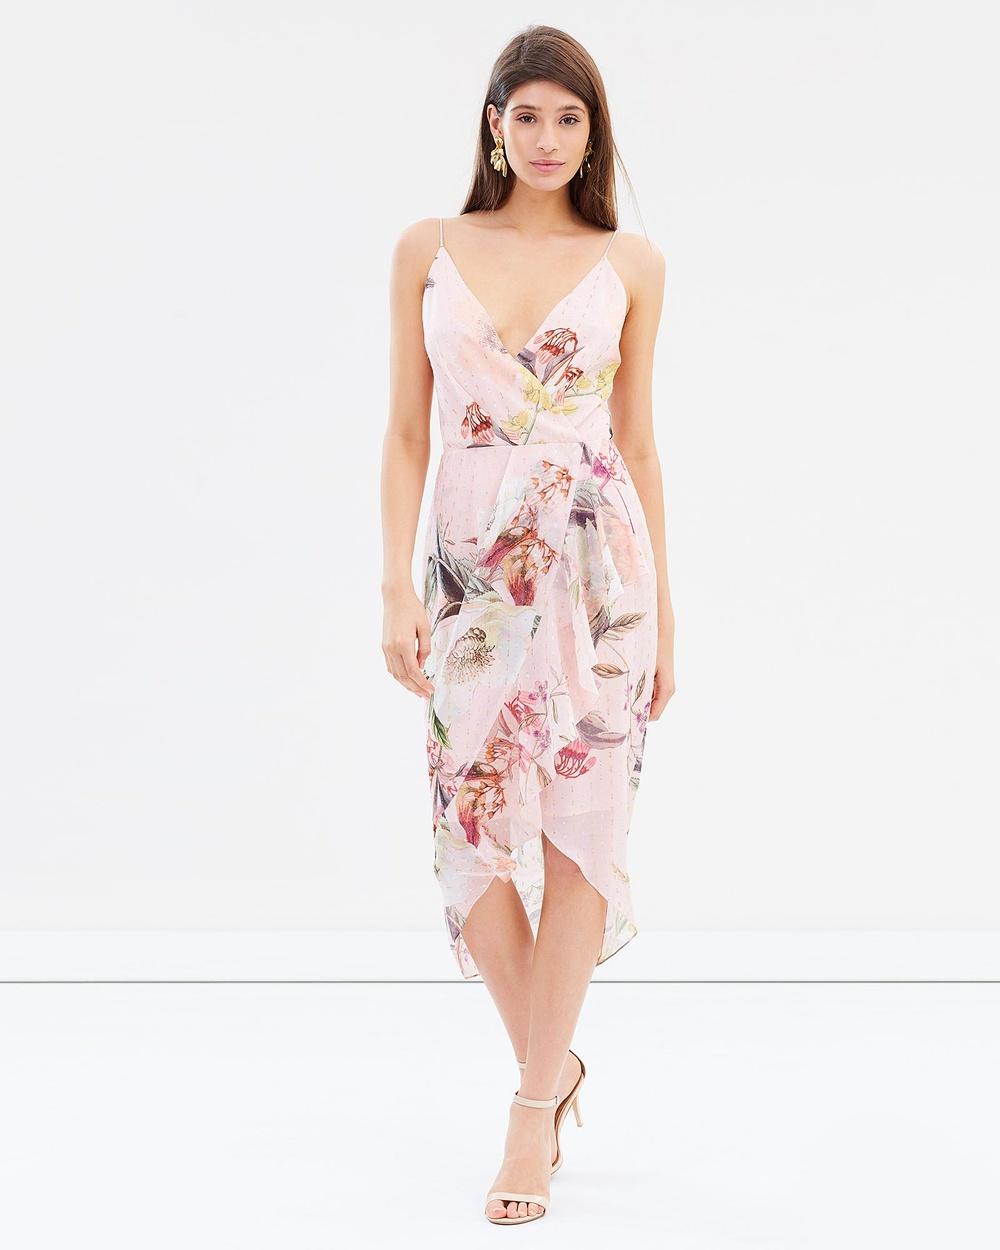 Cooper St Flora Facade Drape Dress Printed Dresses Print Flora Facade Drape Dress